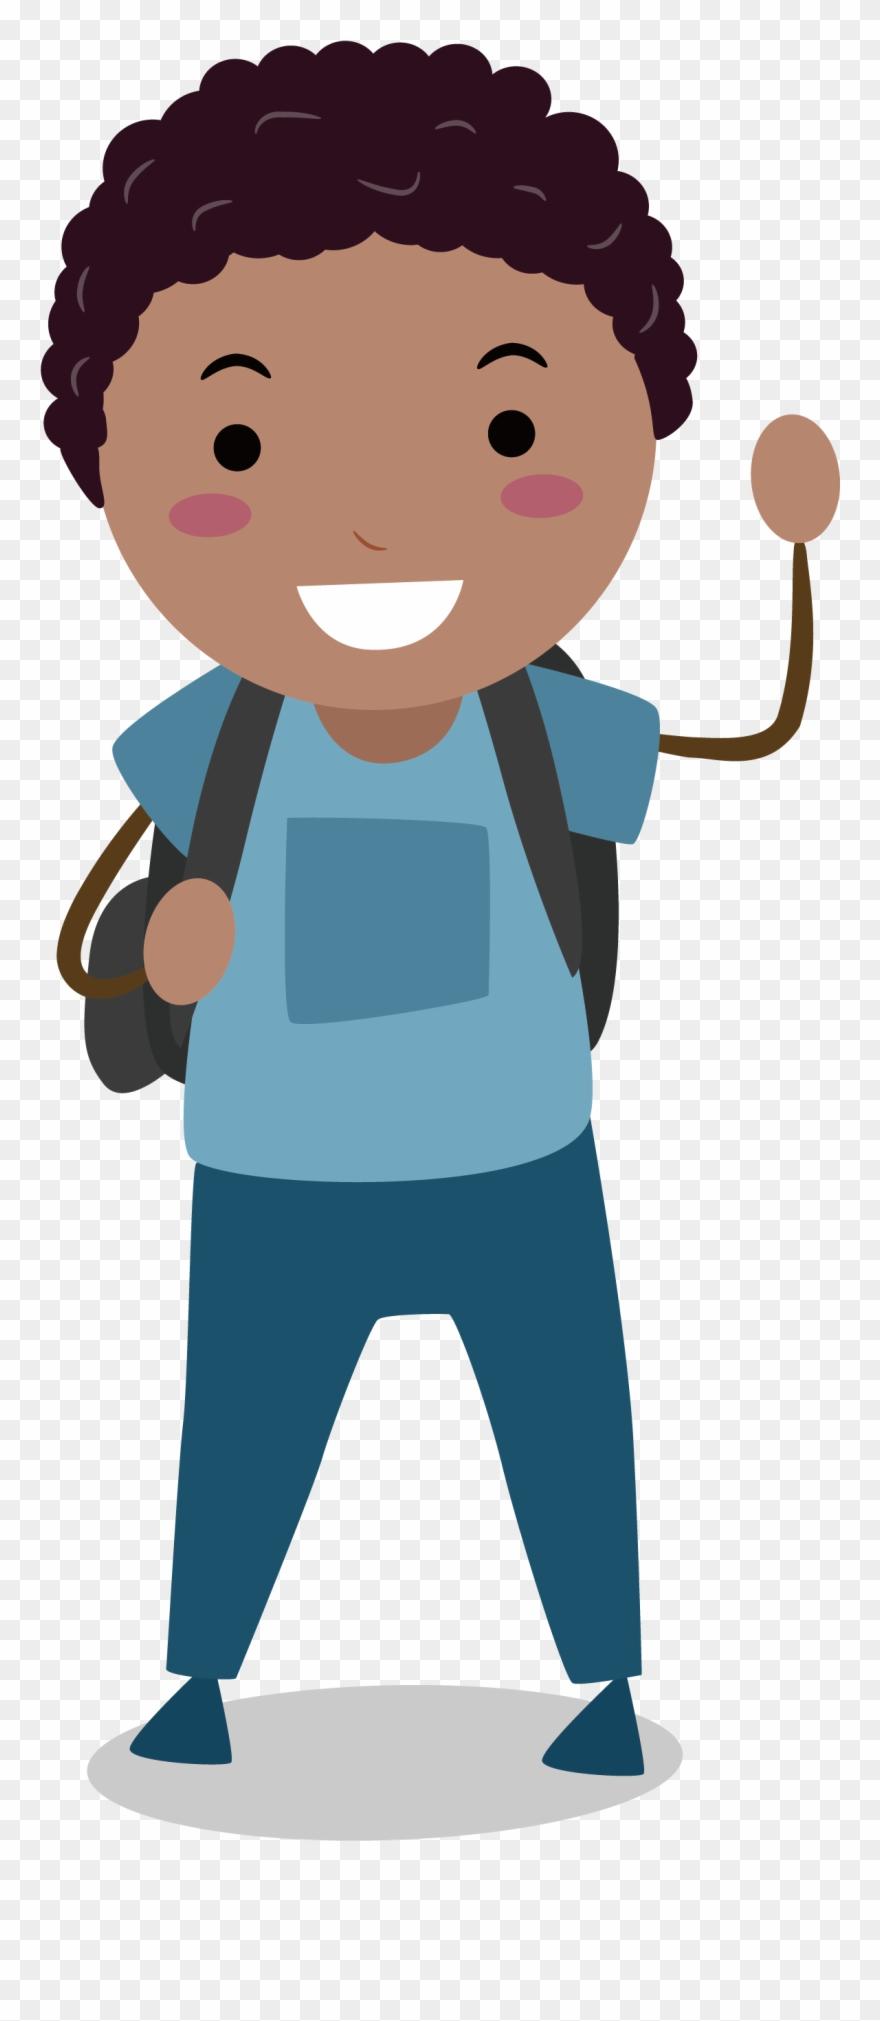 Male Clipart Middle School Boy.